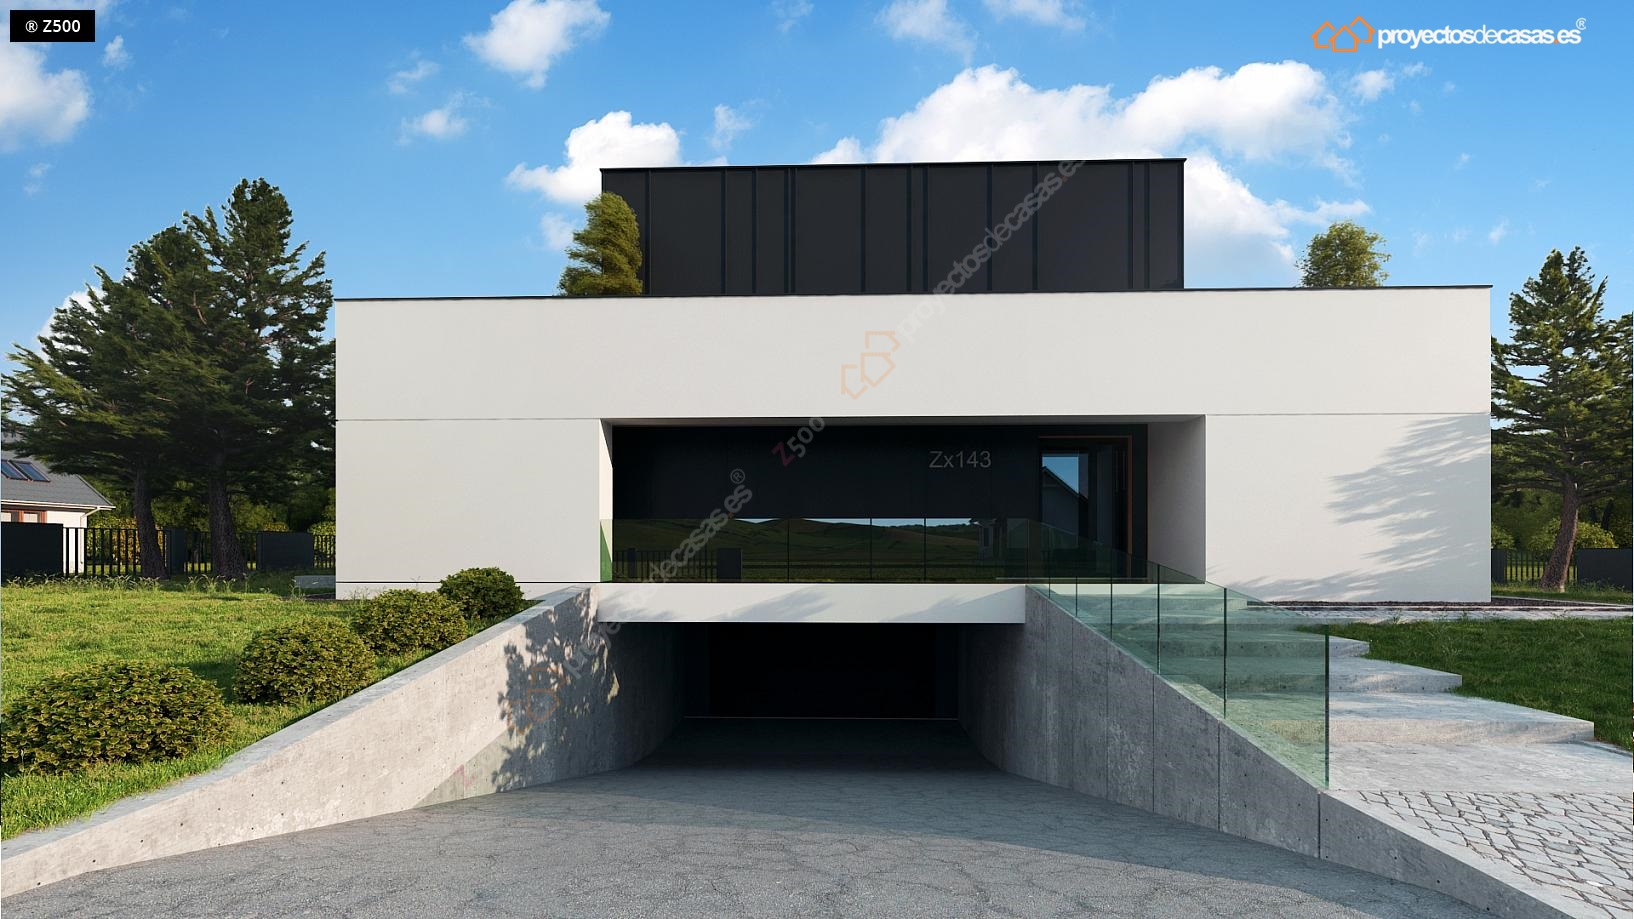 Proyectos de casas original casa loja proyectosdecasas for Oggettistica moderna per la casa